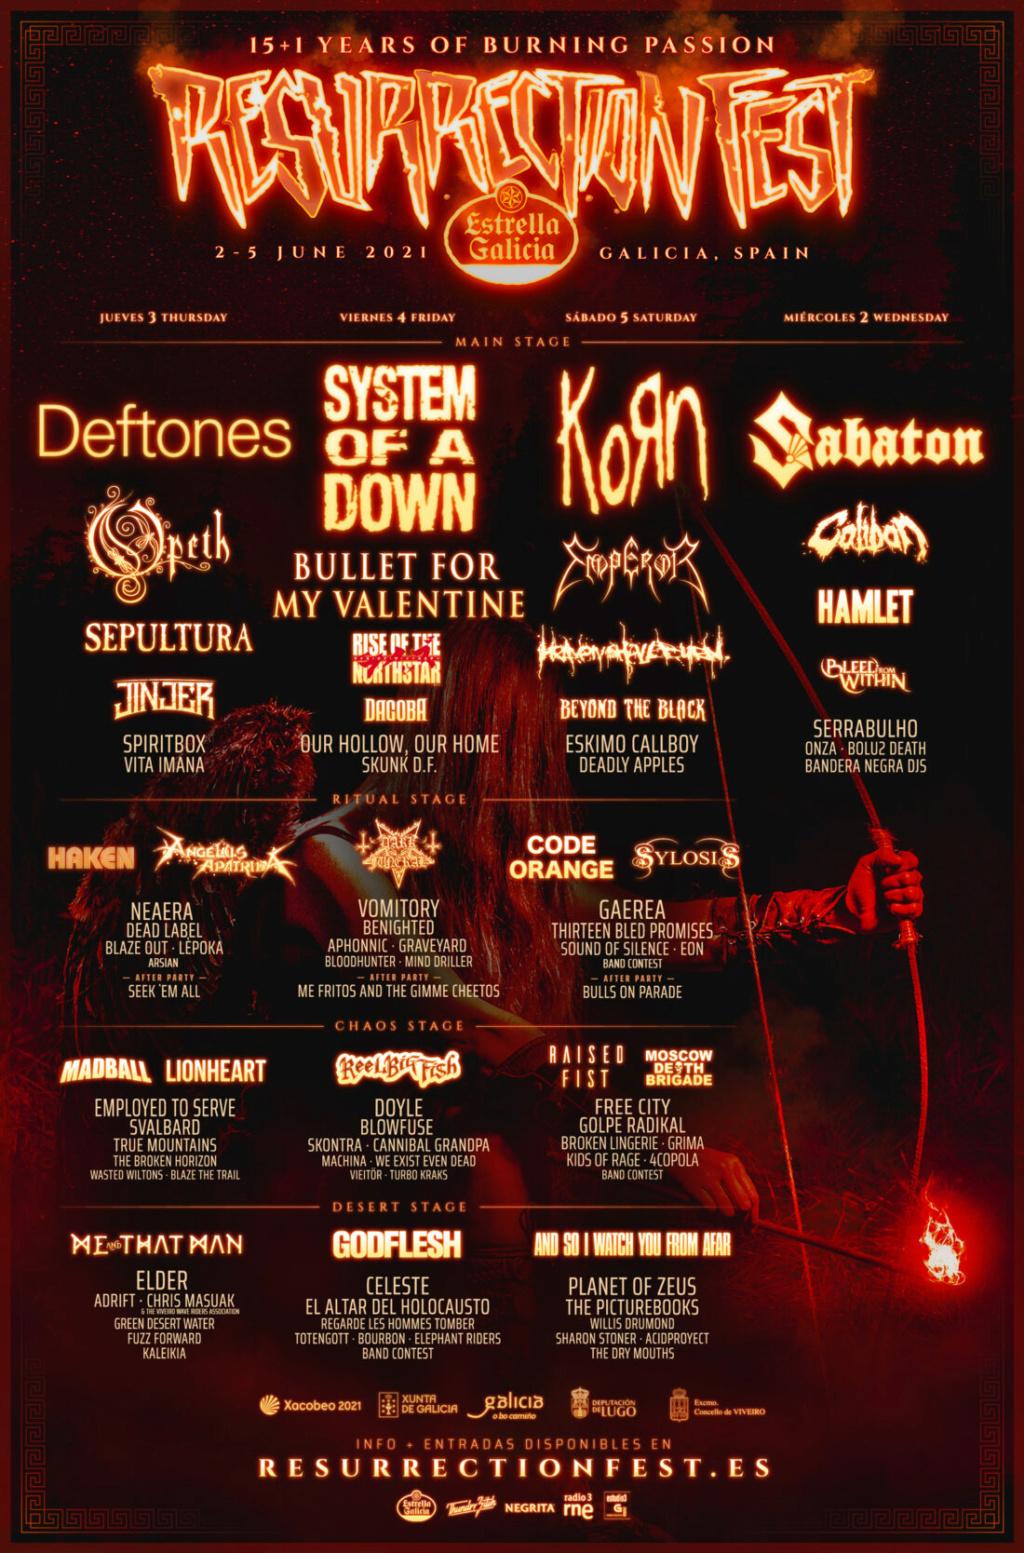 Resurrection Fest Estrella Galicia 2021. (2 - 5 Junio) System of a Down, Deftones, KoRn - Página 2 Resurr10